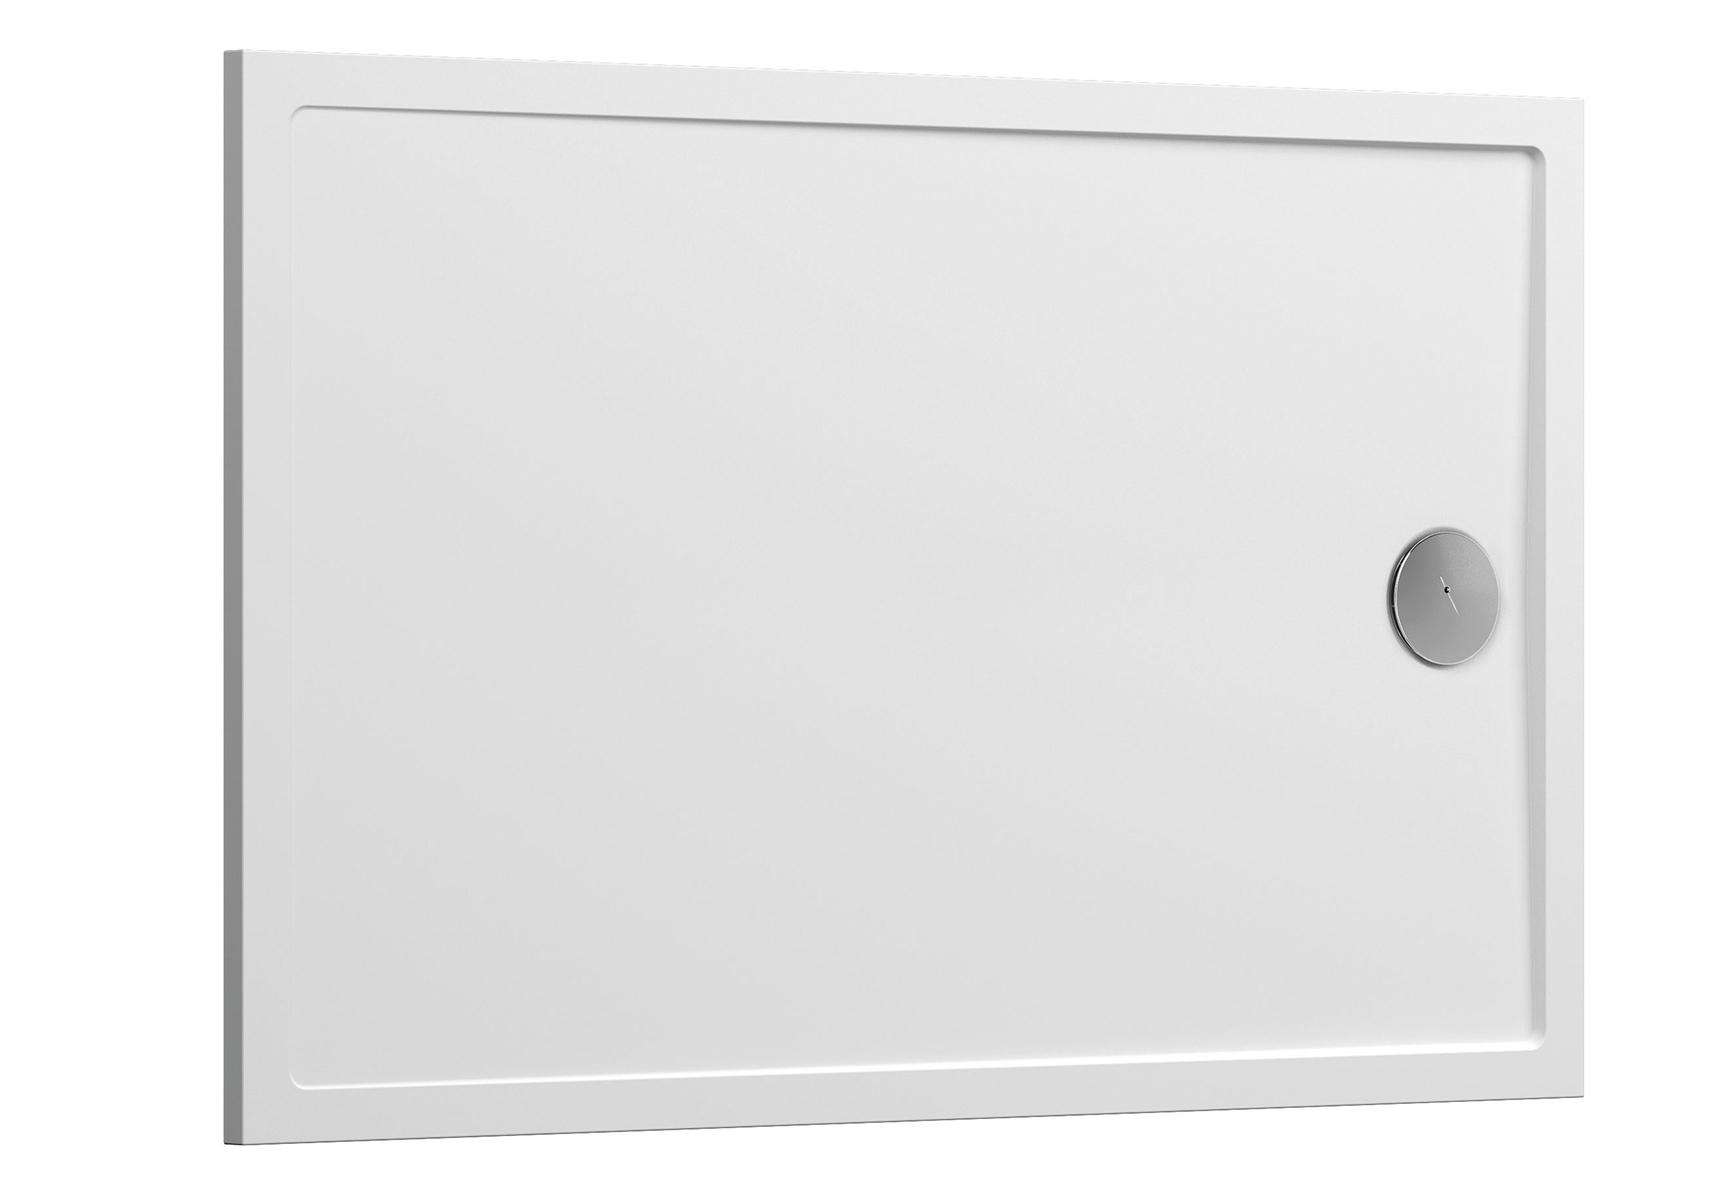 Aruna receveur ultra plat, 120  x  90 cm, en pierre m³ solide, 120  x  90 cm